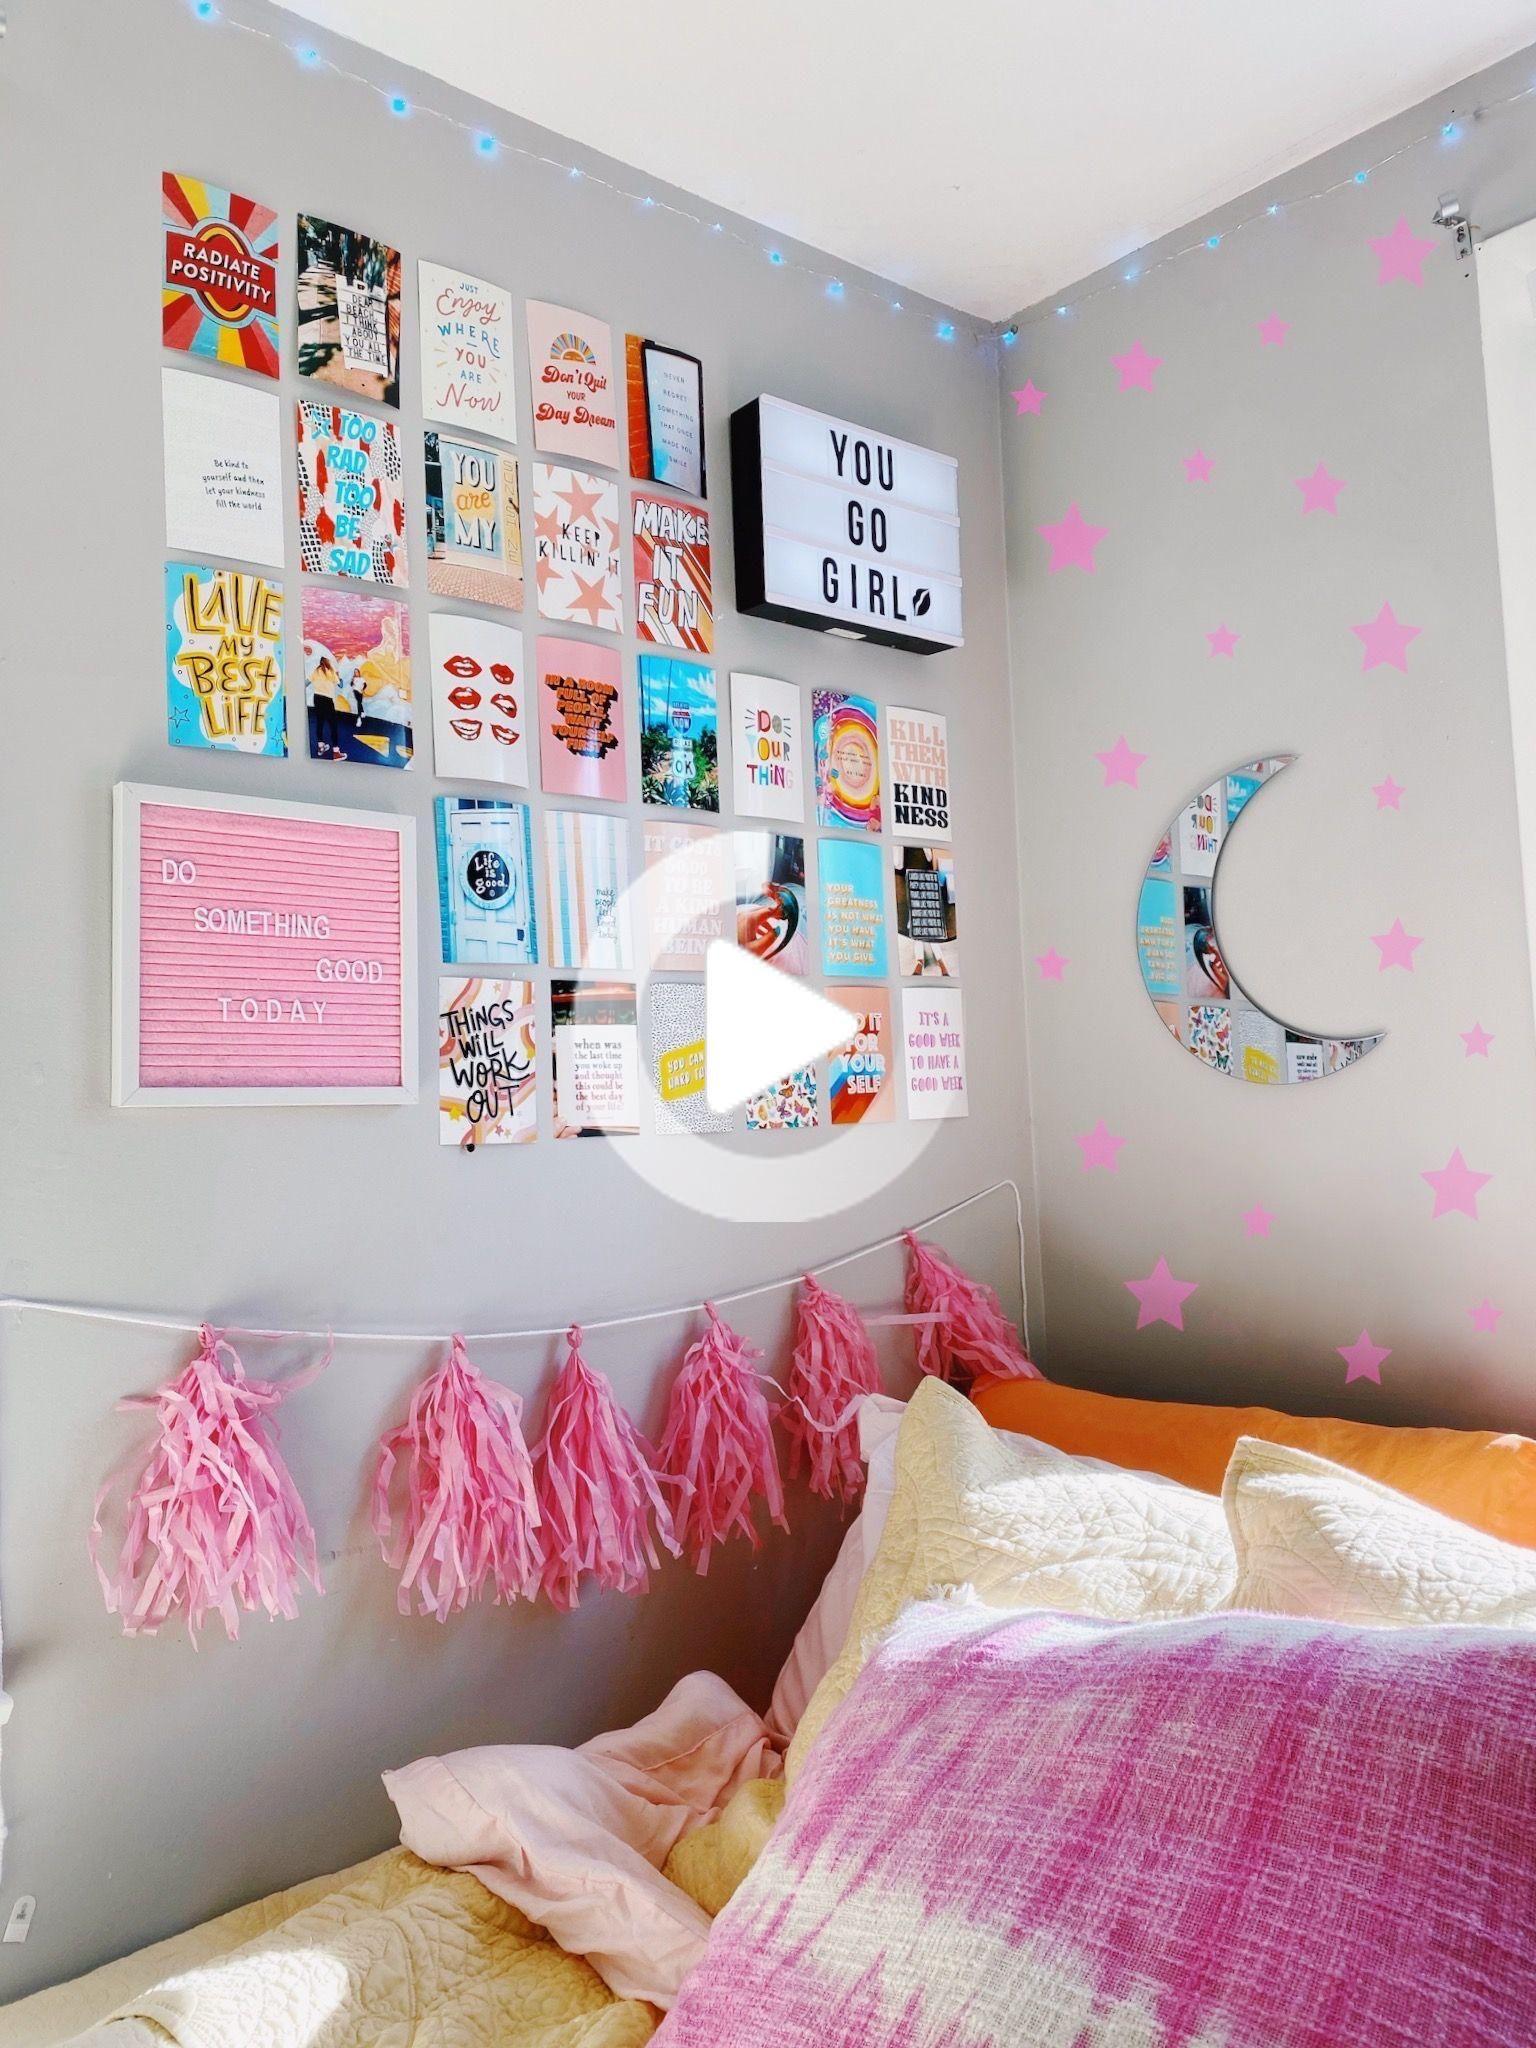 caitysprints on etsy!! { #bedroom #vsco #roomgoals #dorm #dormroom #wallart #walldecor #etsyshop #summer #positivevibes } #bedroomideas #smallbedroom